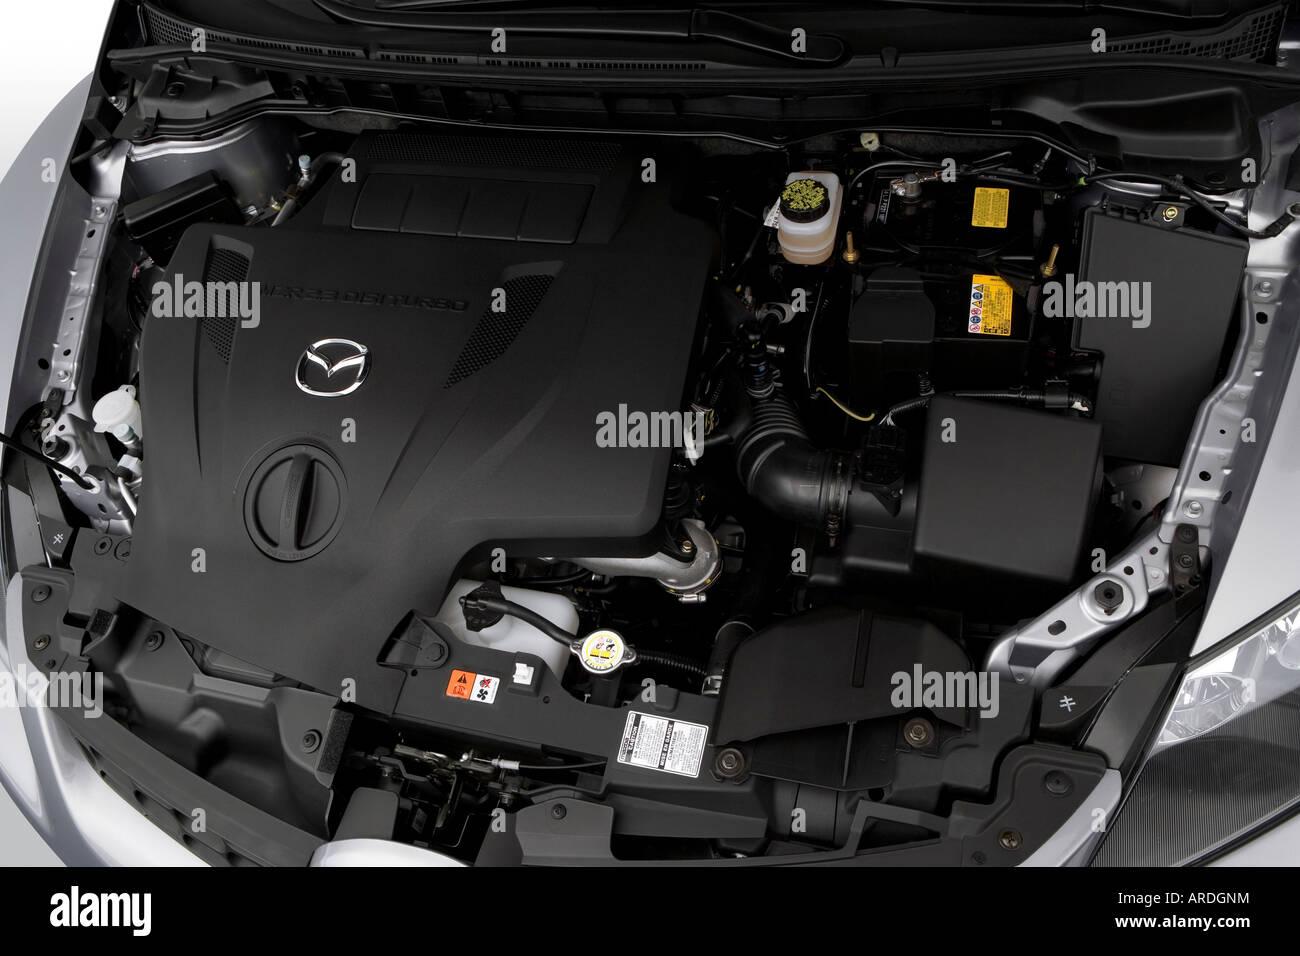 2007 Mazda CX 7 Grand Touring Em Cinza   Motor